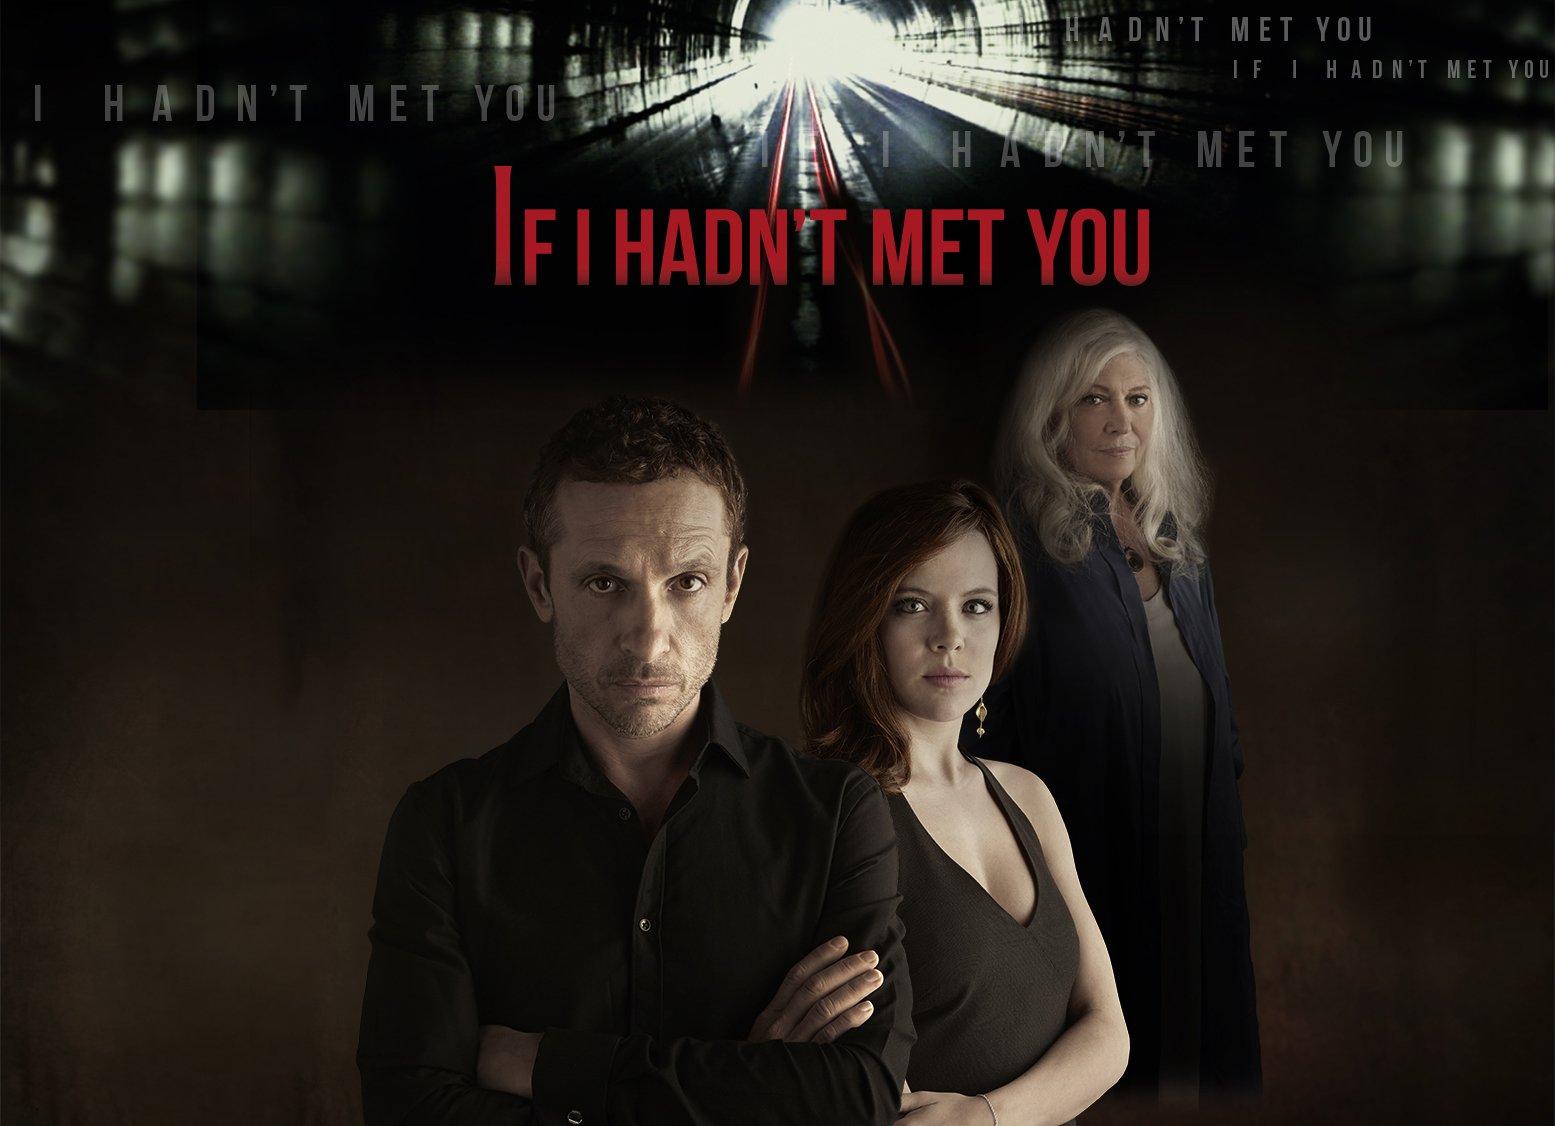 rencontres dans le Royaume-Uni Dark ITV Klamath tombe branchement